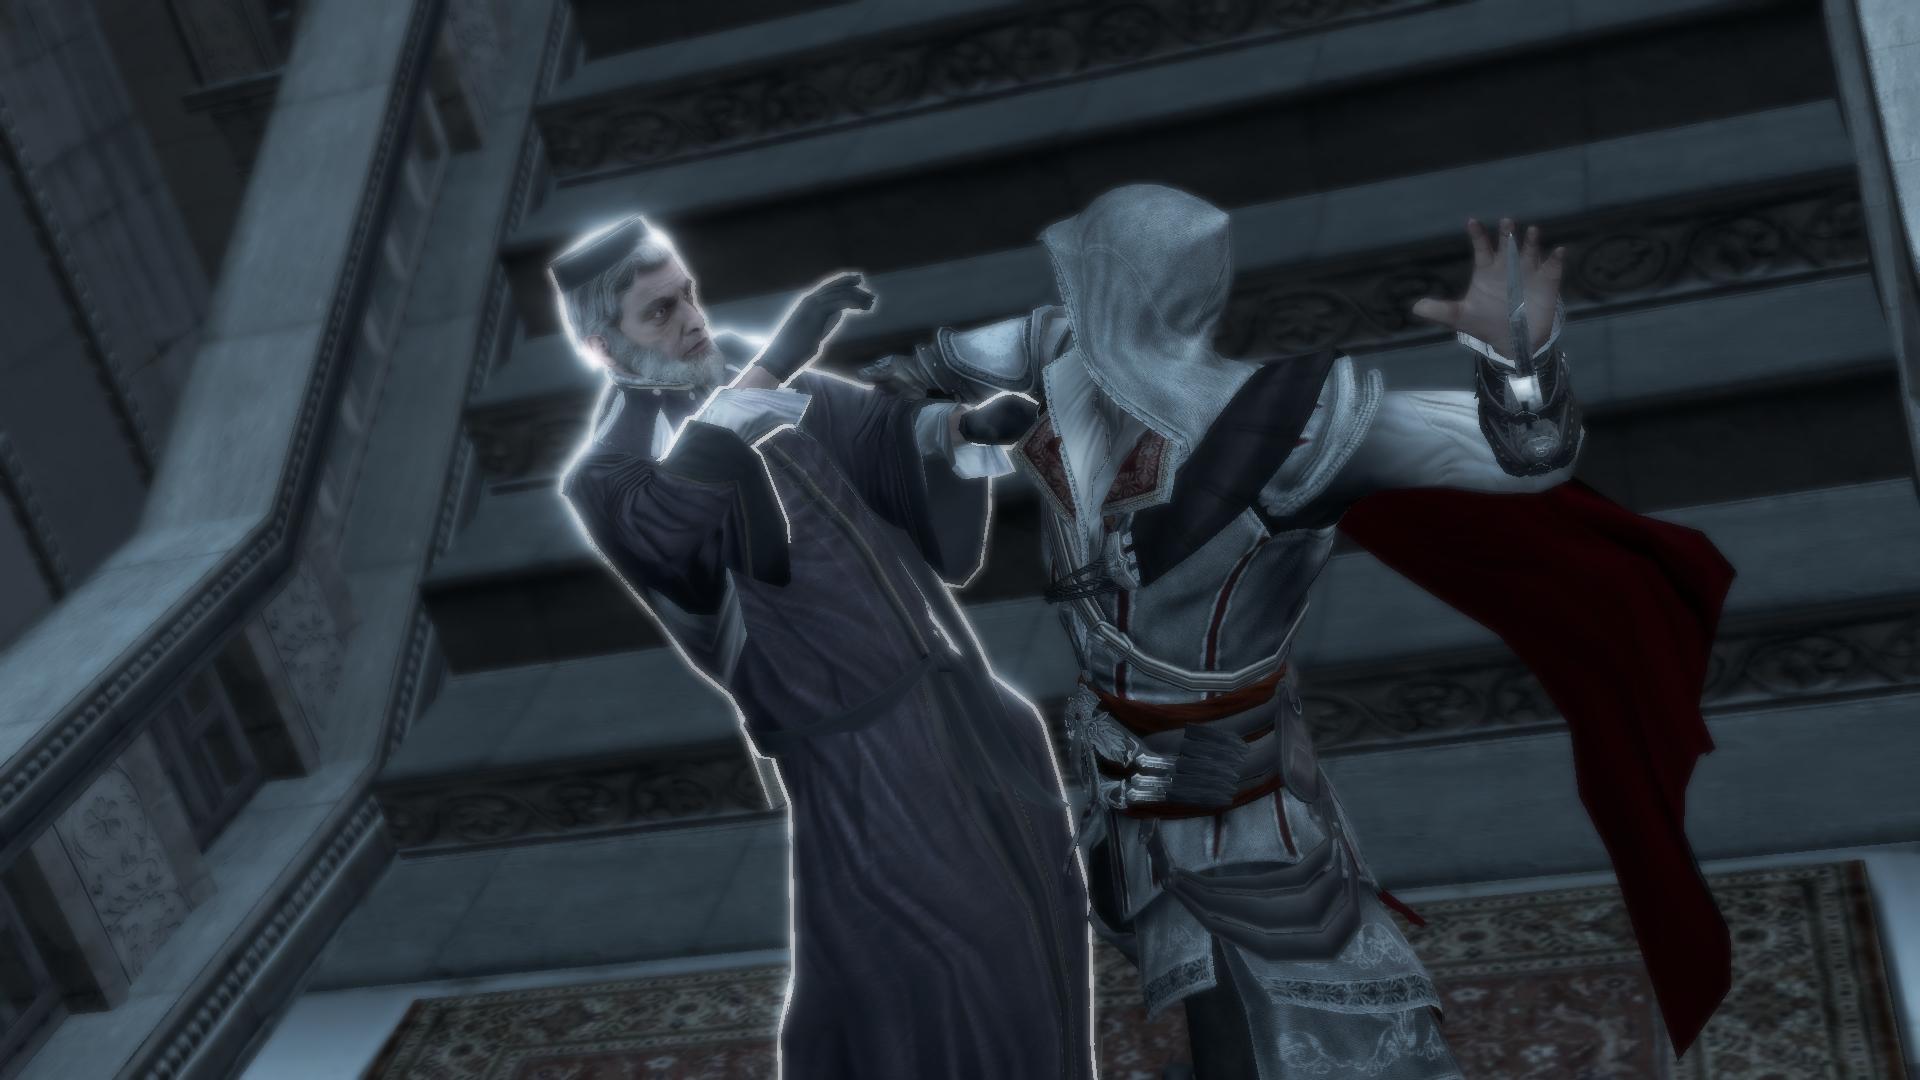 Assassins creed brotherhood radioactive dating